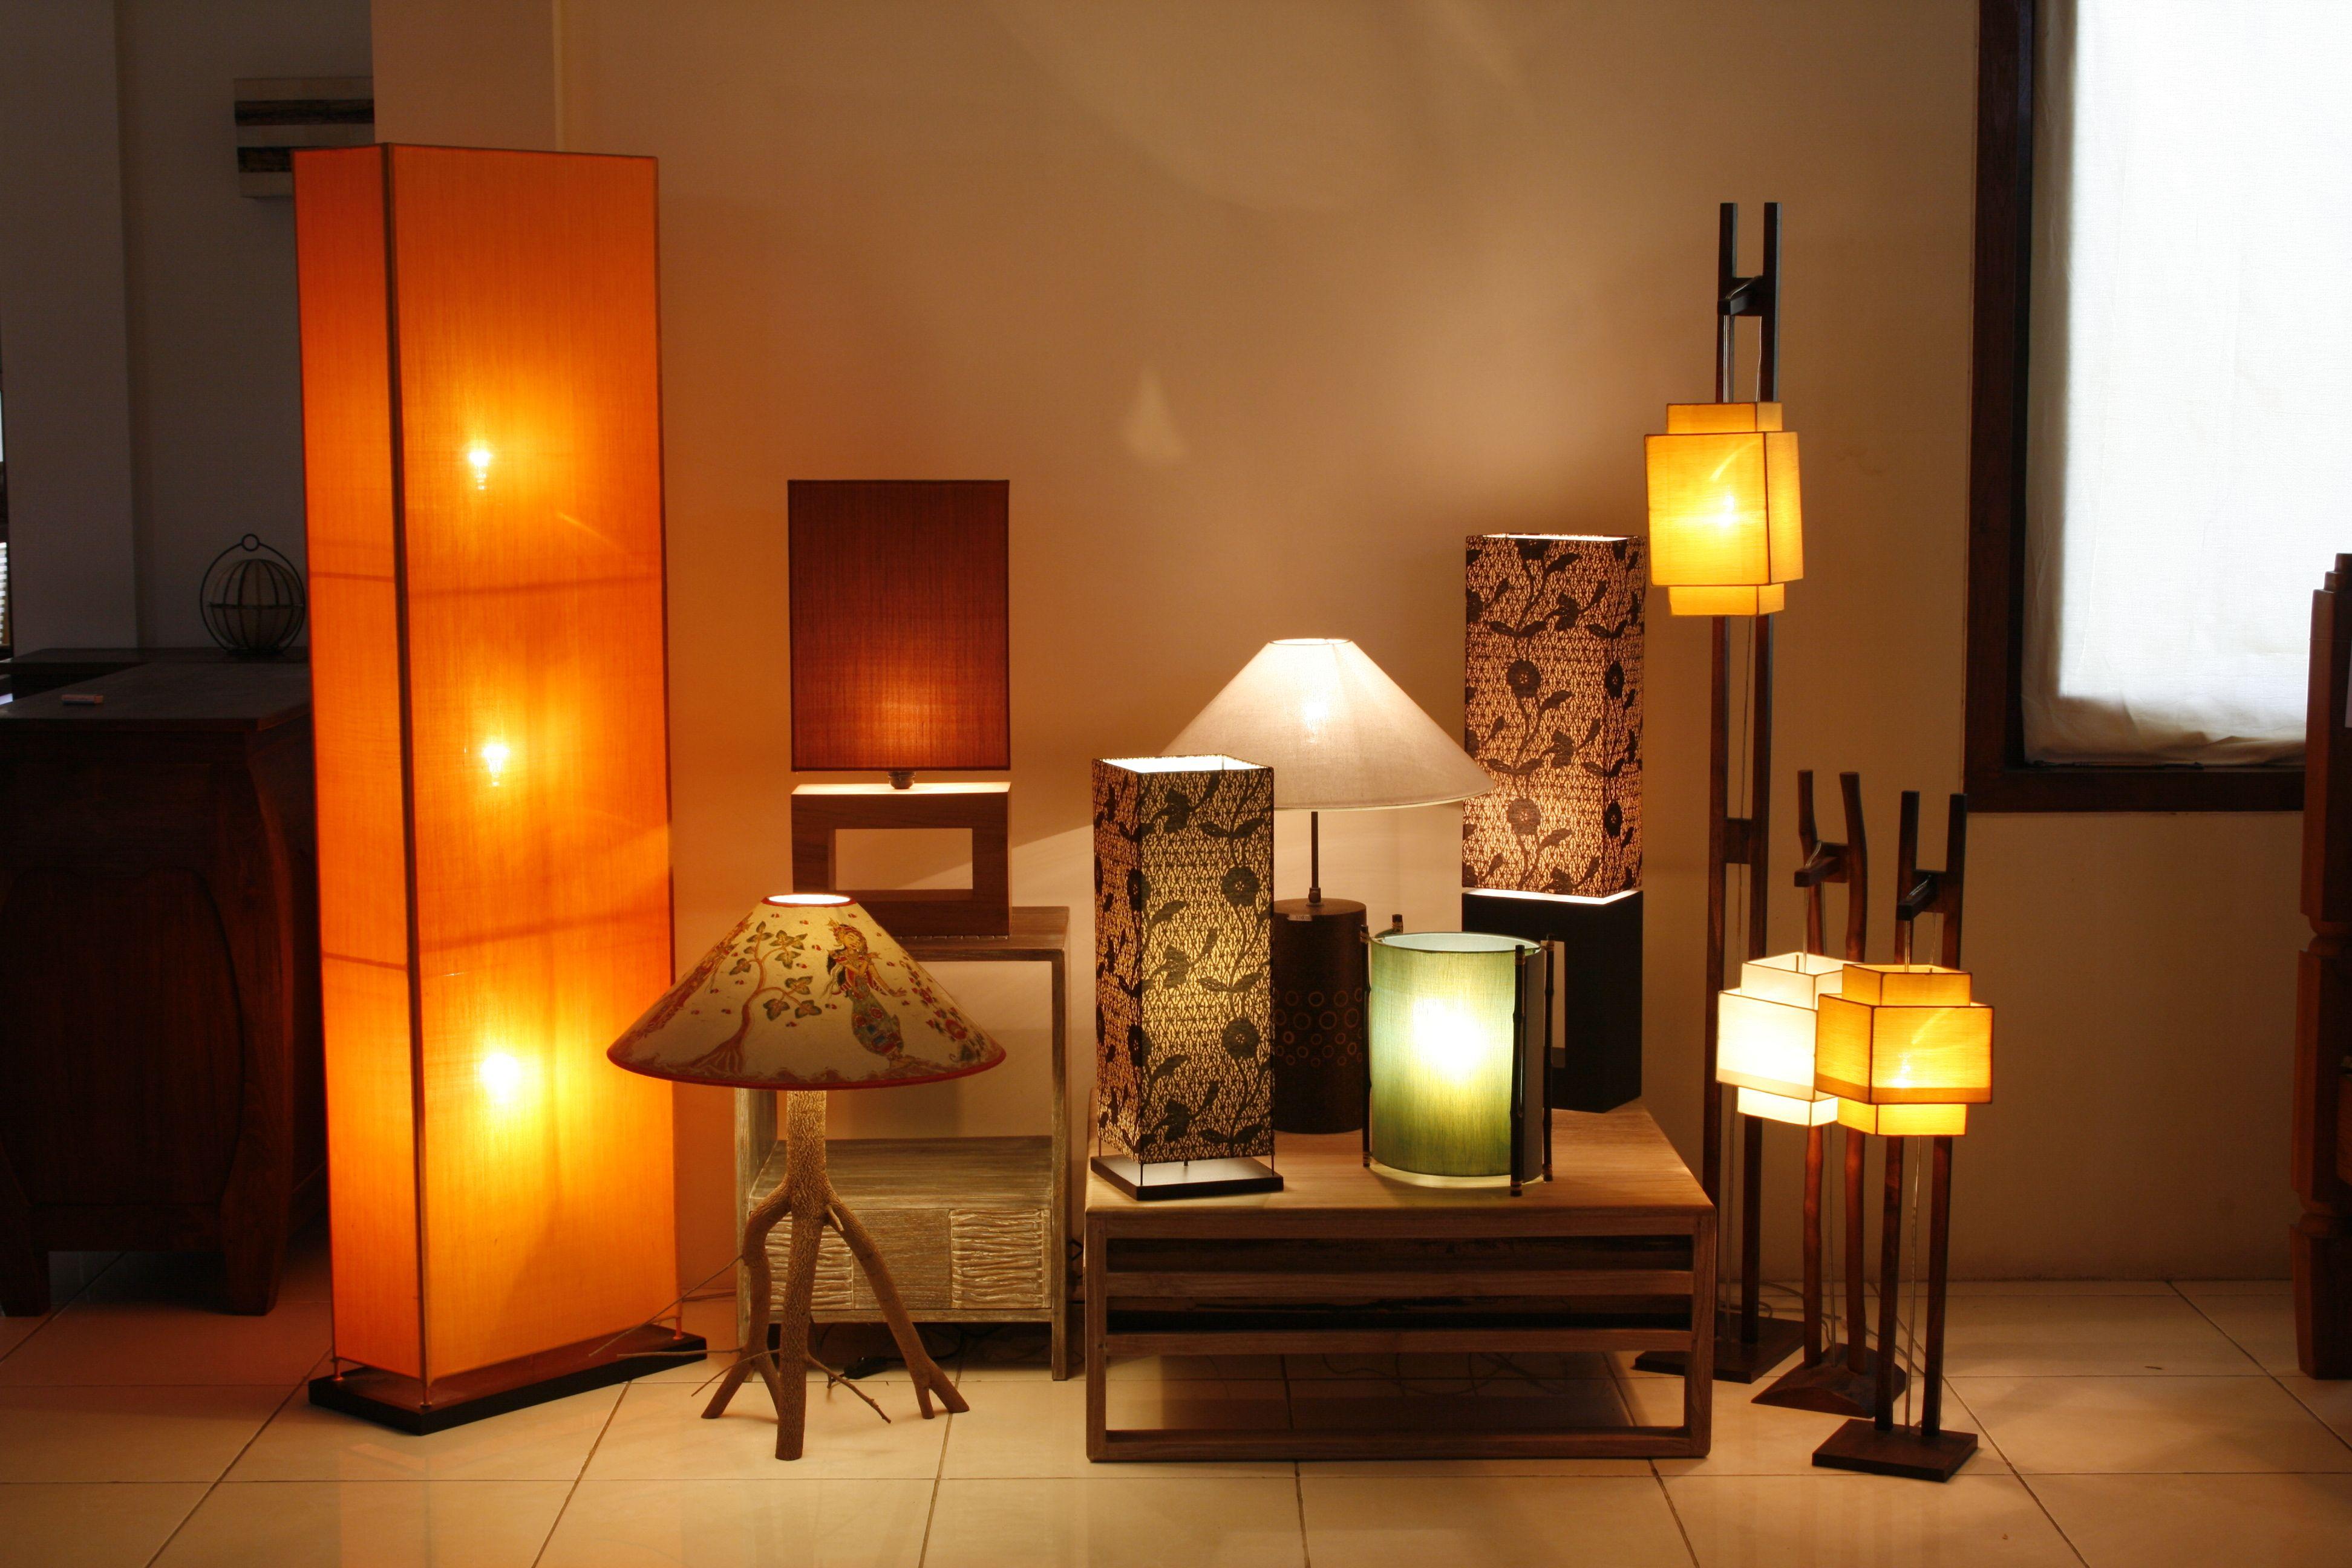 Lamp lamps lampshade lampshades lighting furniture handicraf lamp lamps lampshade lampshades lighting furniture handicraft bali aloadofball Gallery